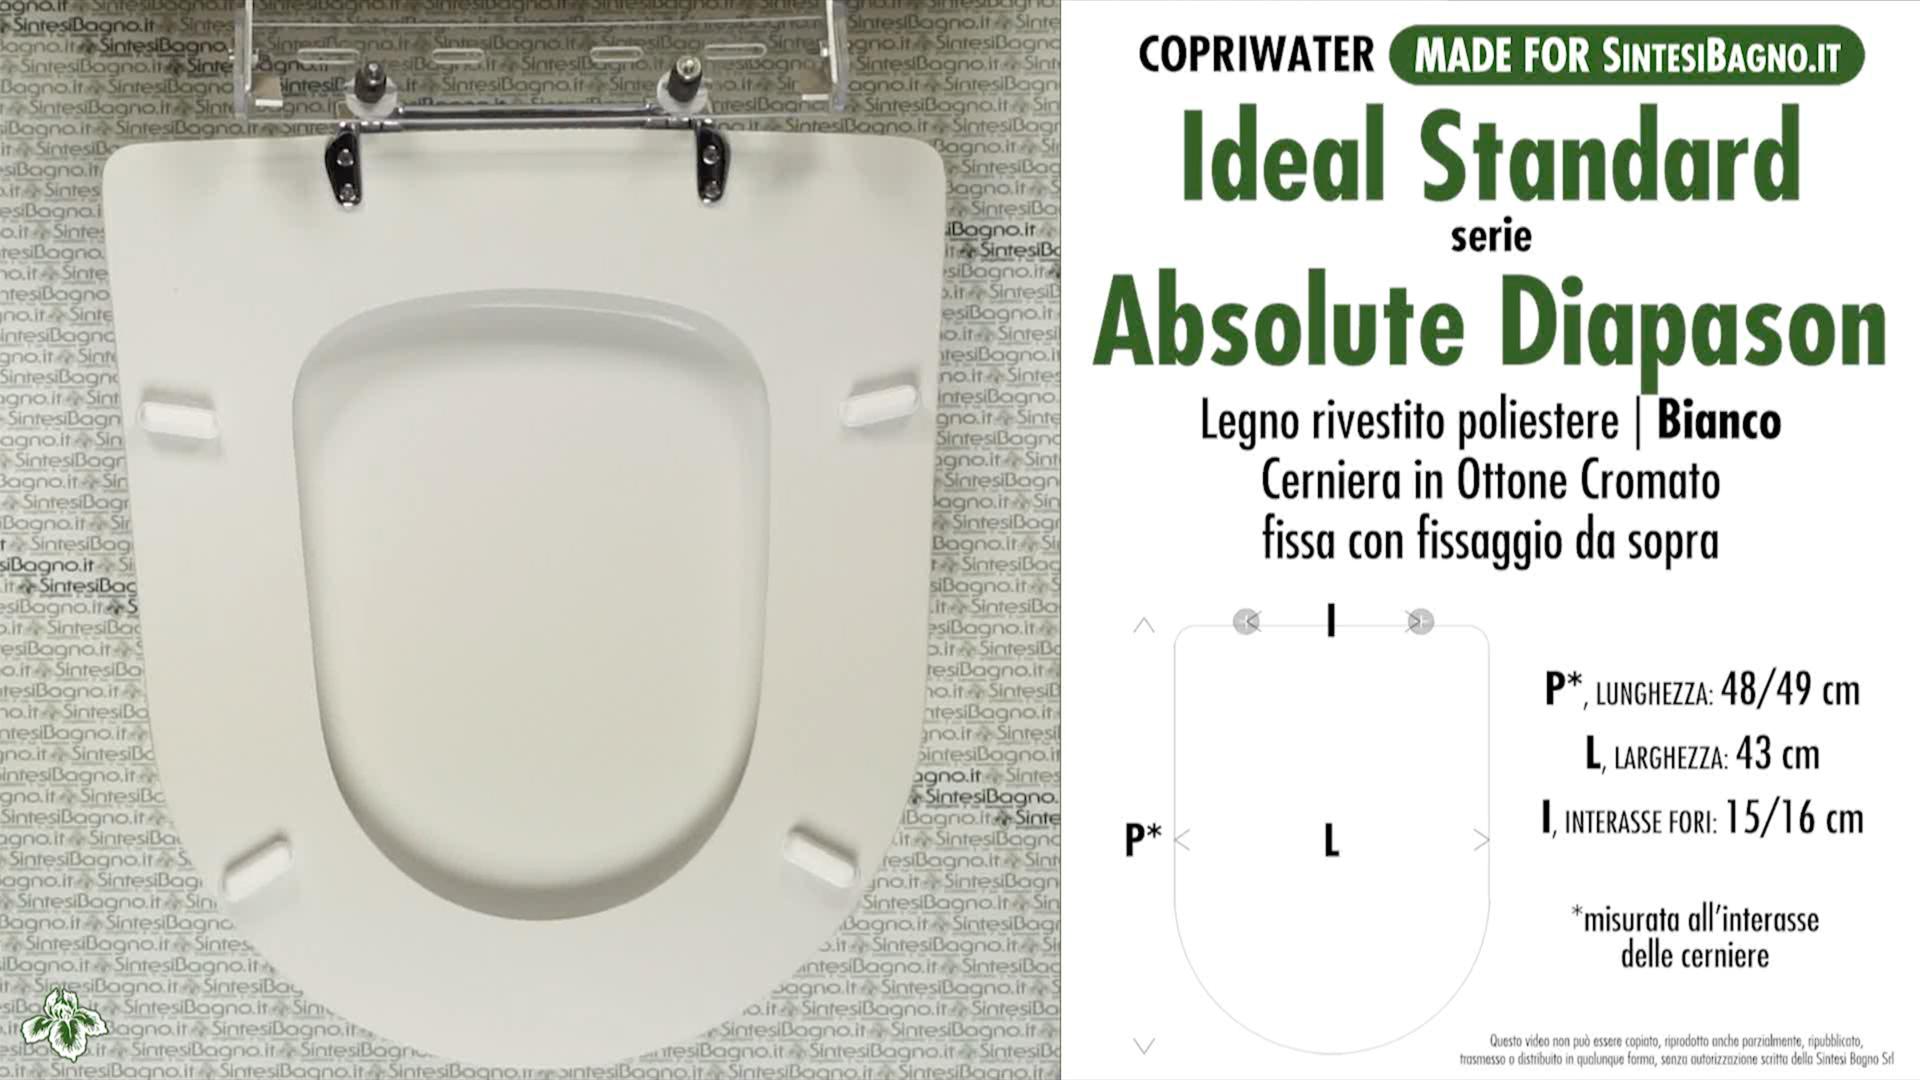 Copriwater Sedile Wc Absolute Dhiapason Ideal Standard